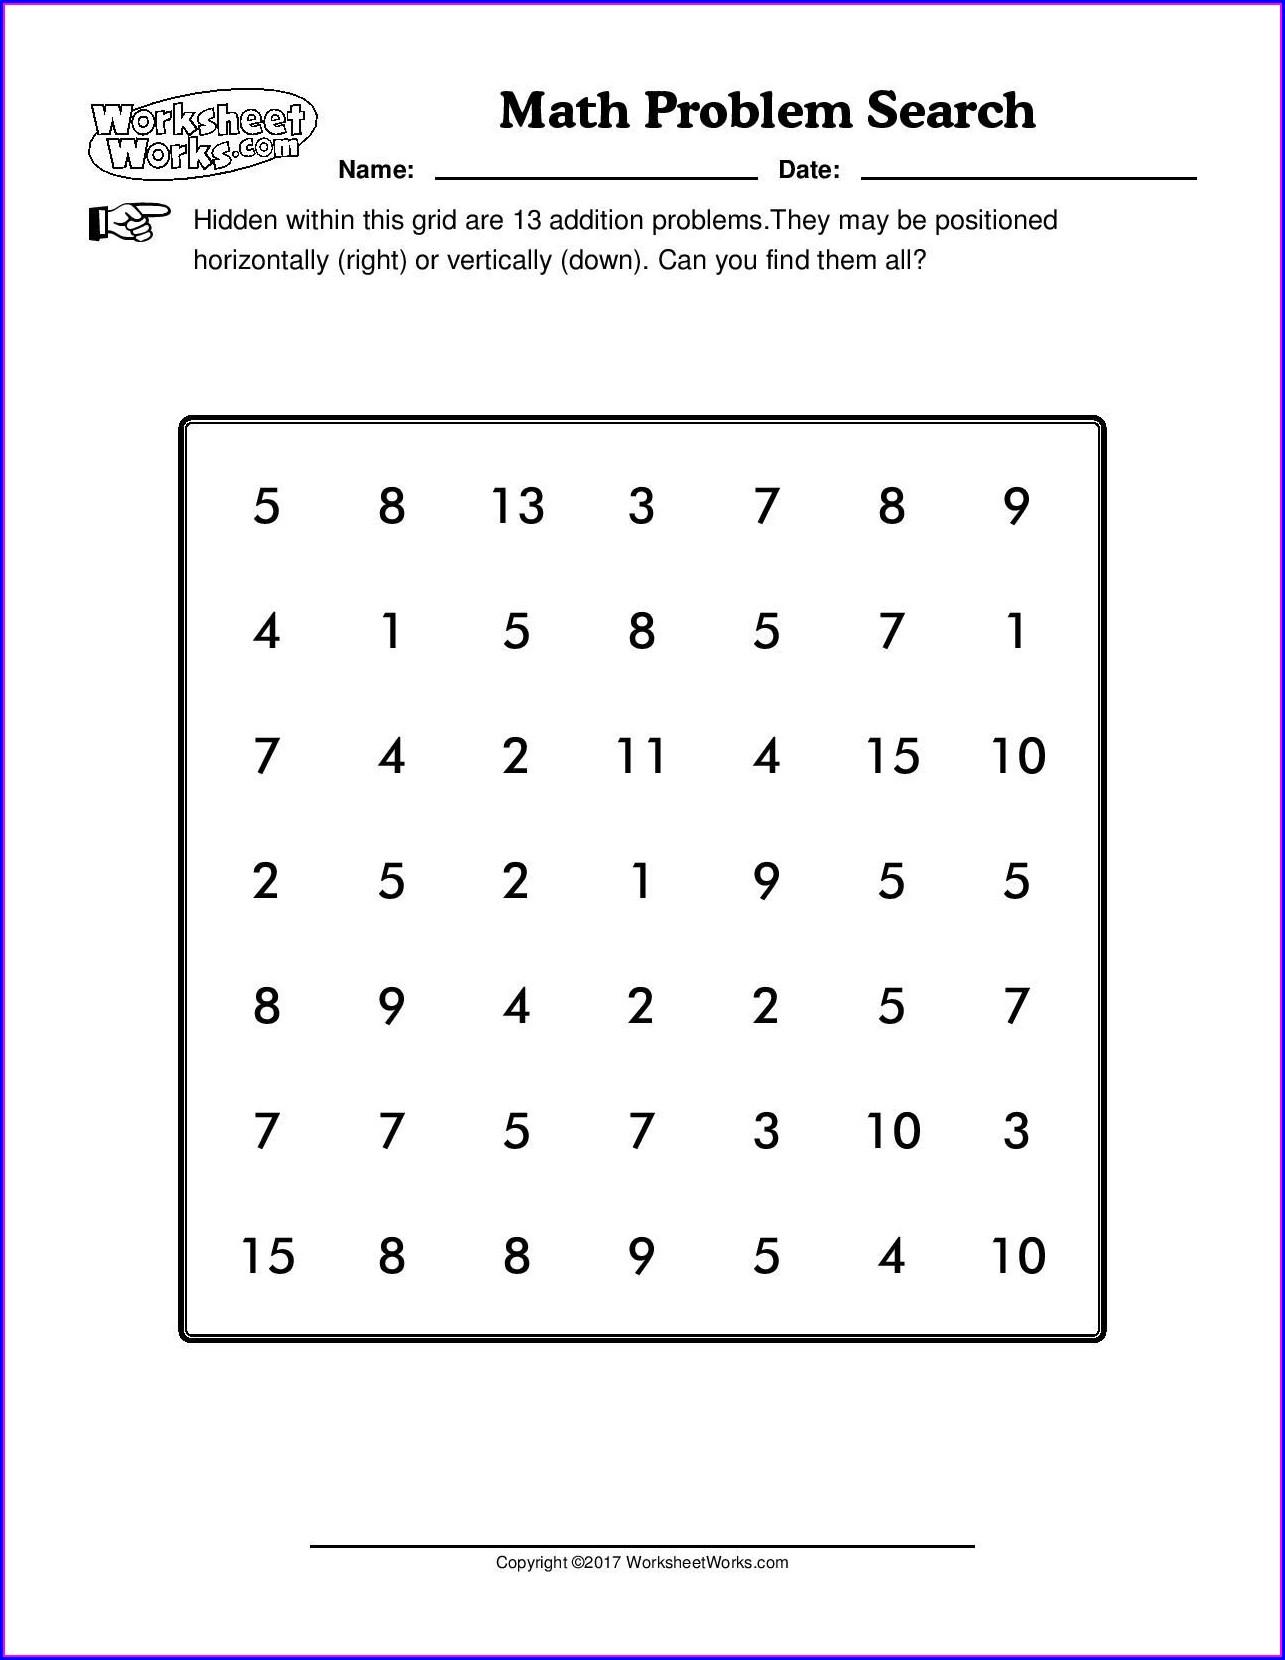 Worksheet Workscom Math